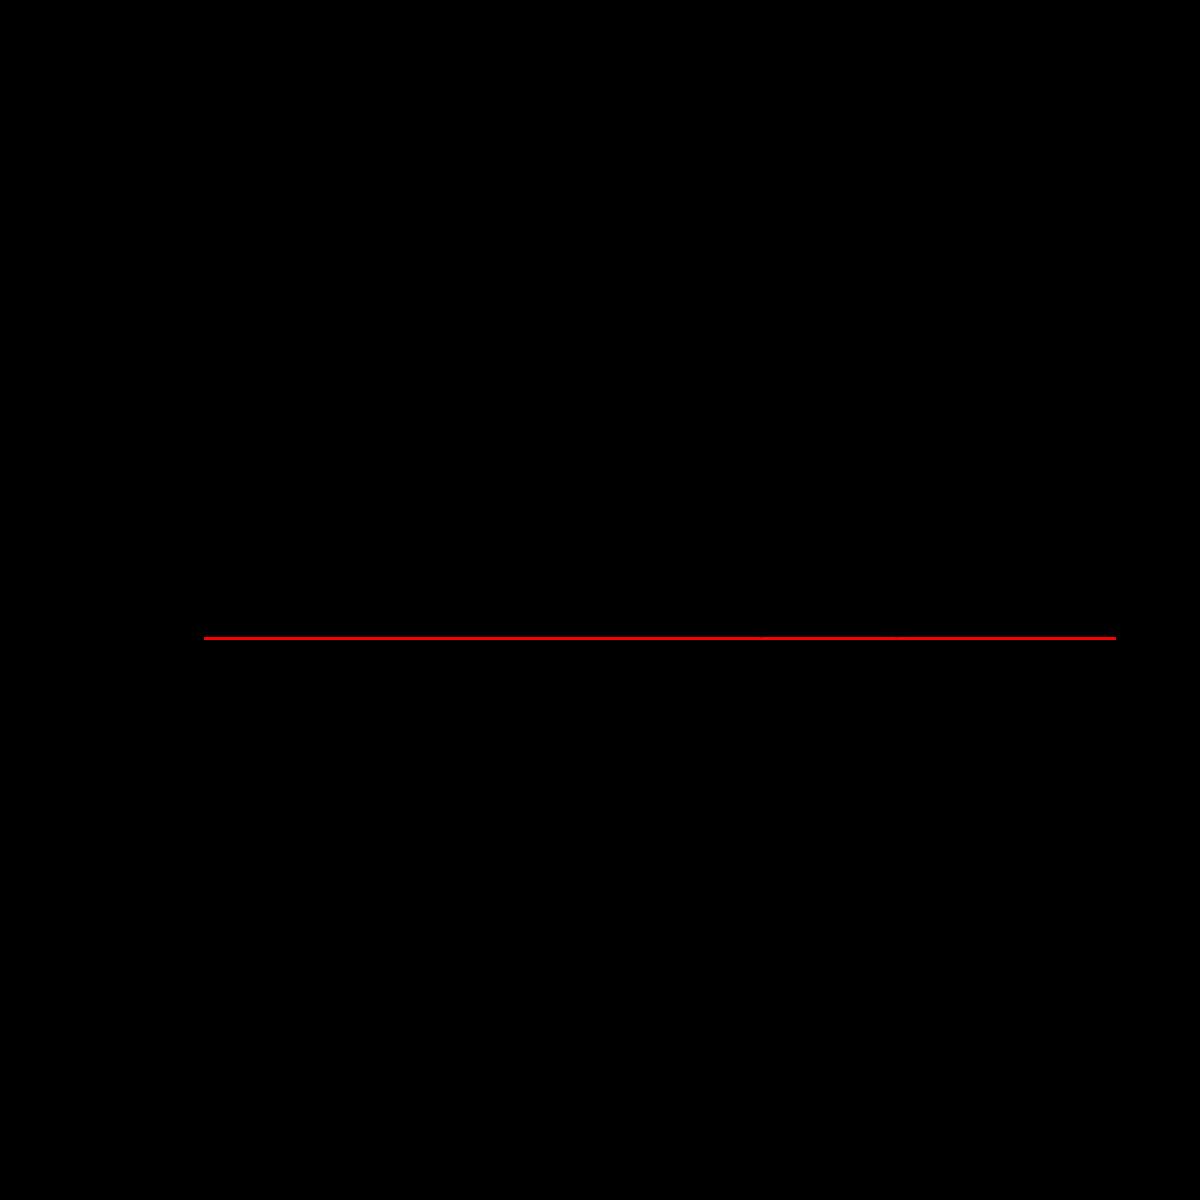 box plot pdf